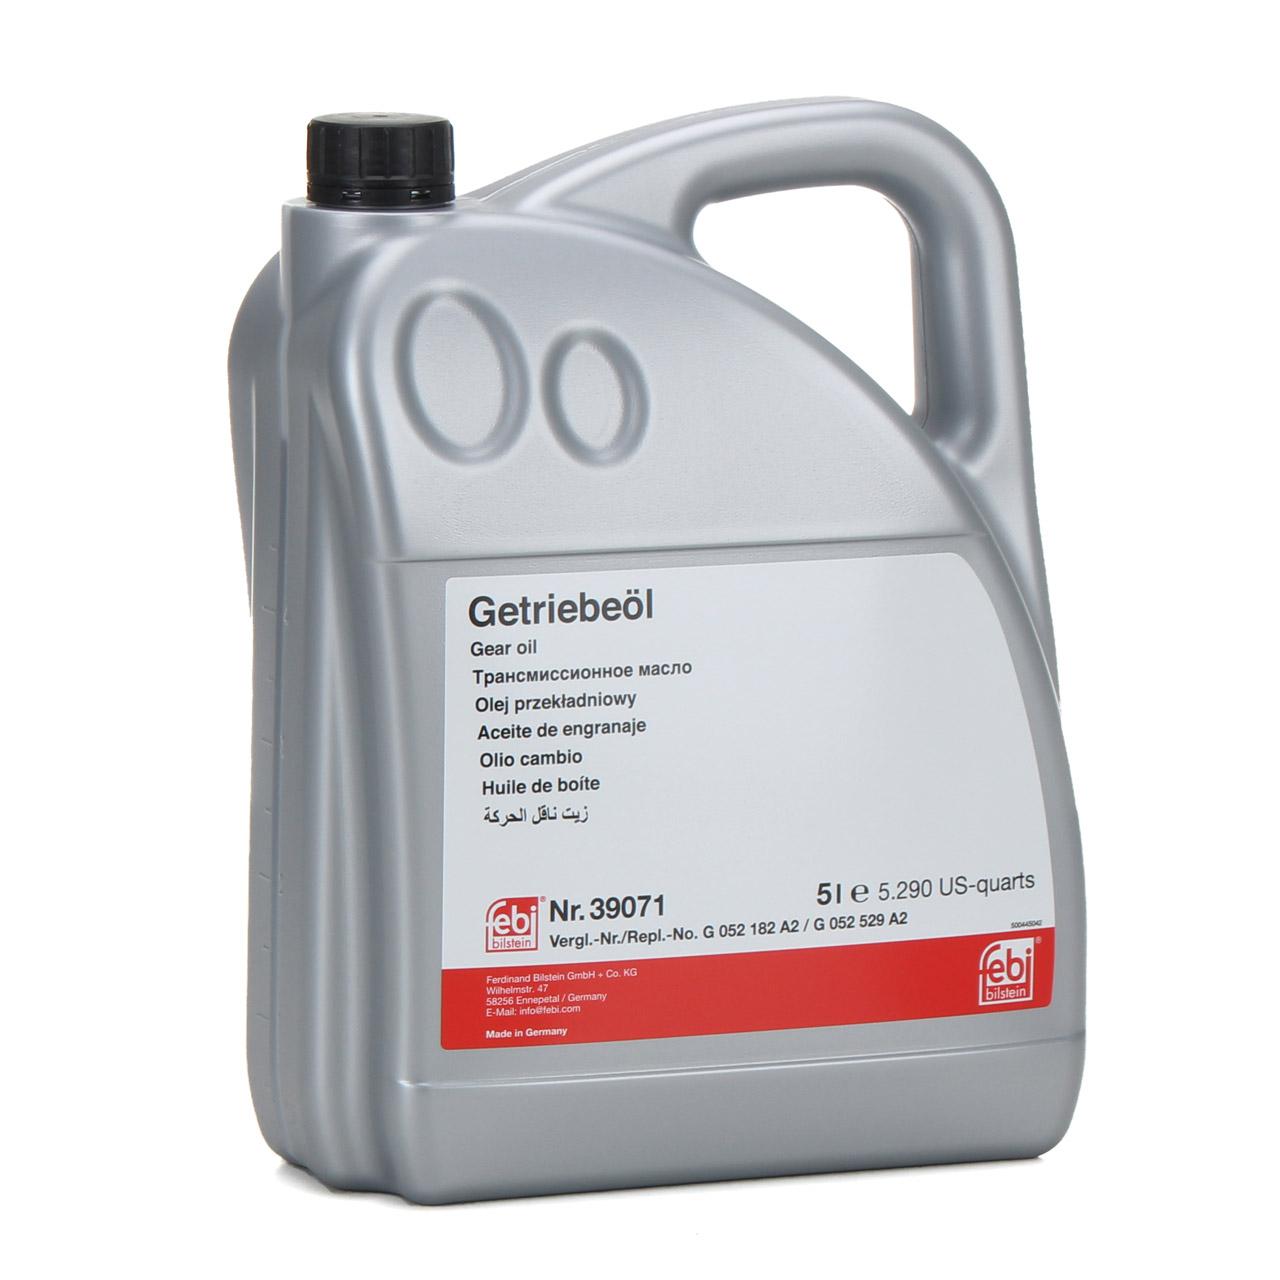 HENGST Hydraulikfilter + Dichtung + 6L FEBI Getriebeöl MERCEDES W176 W246 C117 X117 X156